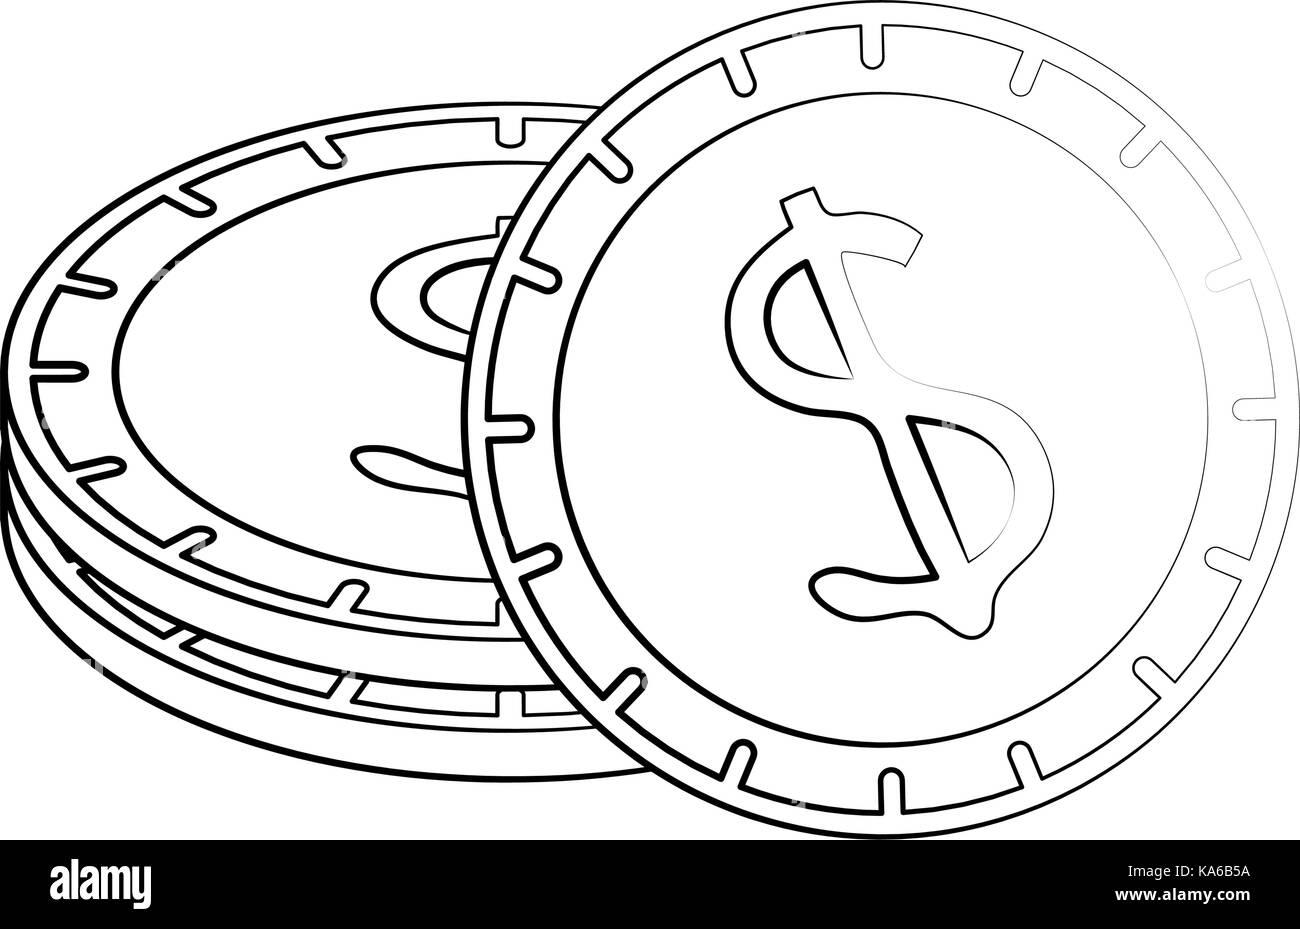 Cent Symbol Vector Sketch Stock Photos Cent Symbol Vector Sketch